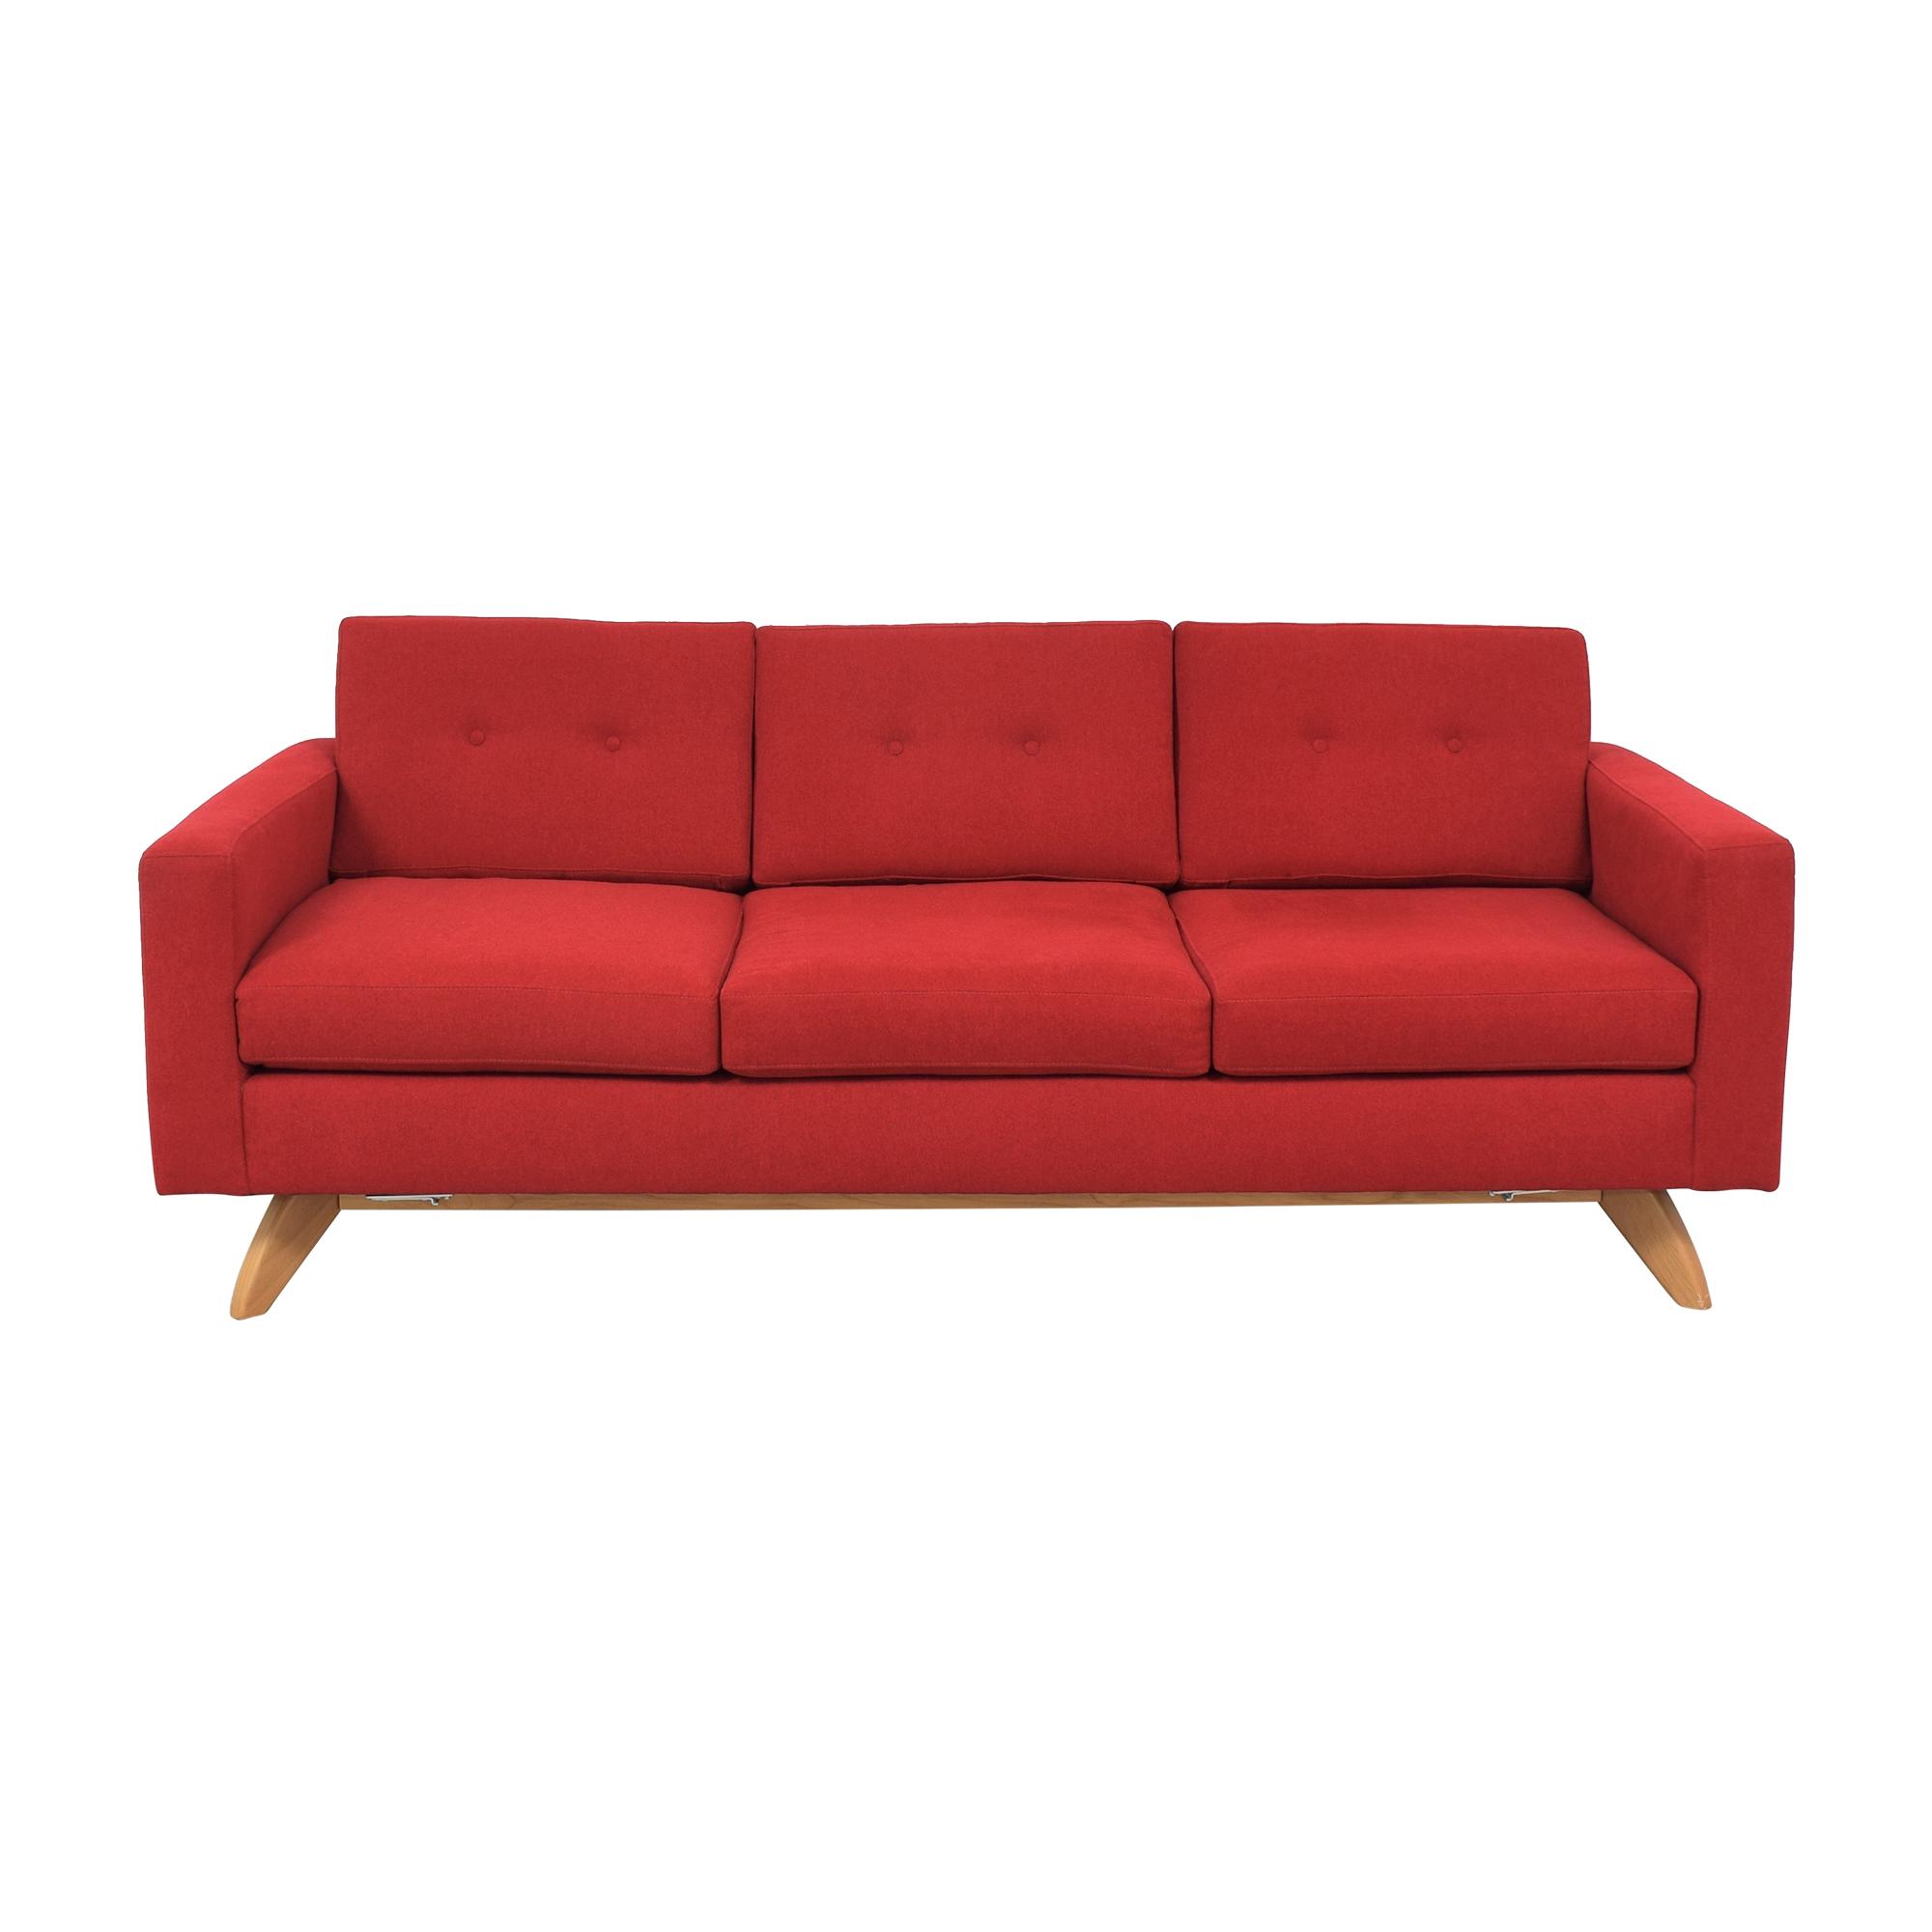 shop TrueModern TrueModern Luna Loft Sofa online